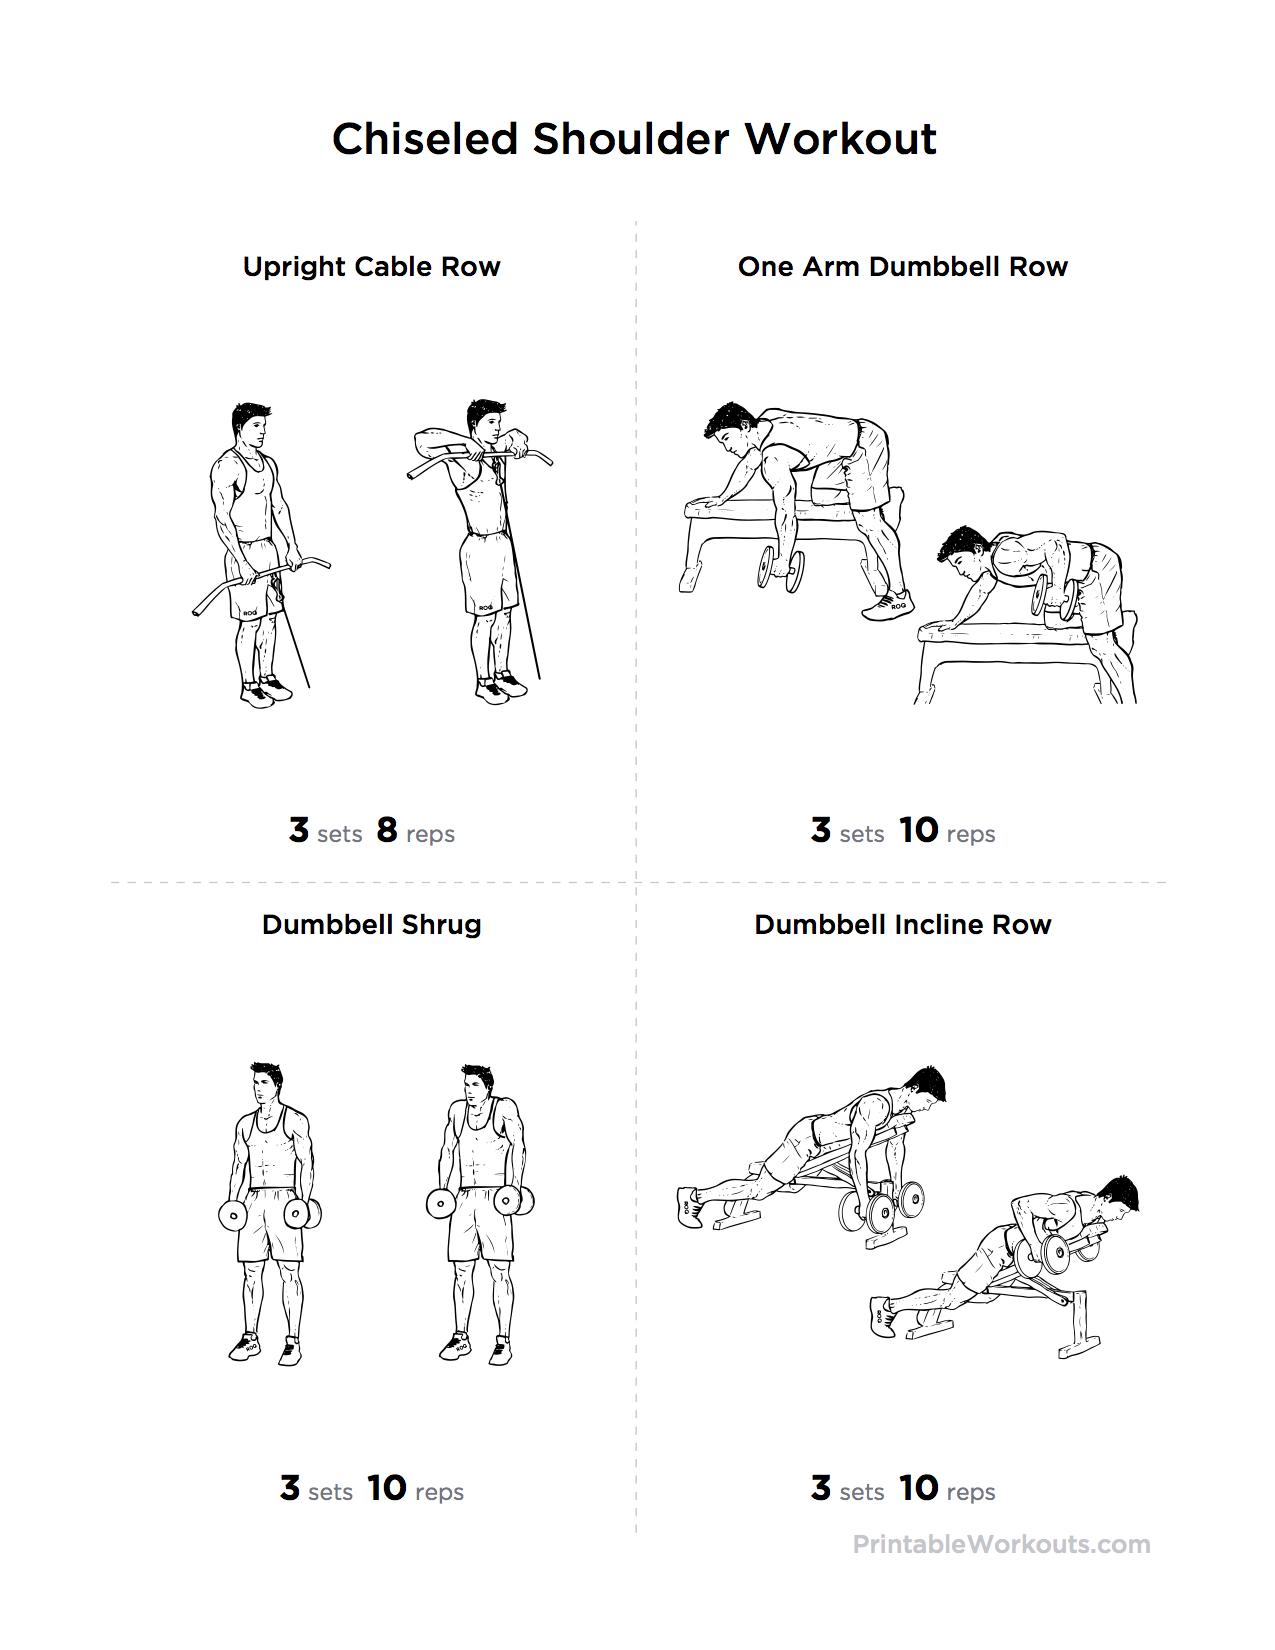 Printable Chiseled Shoulder Workout Create Free Custom